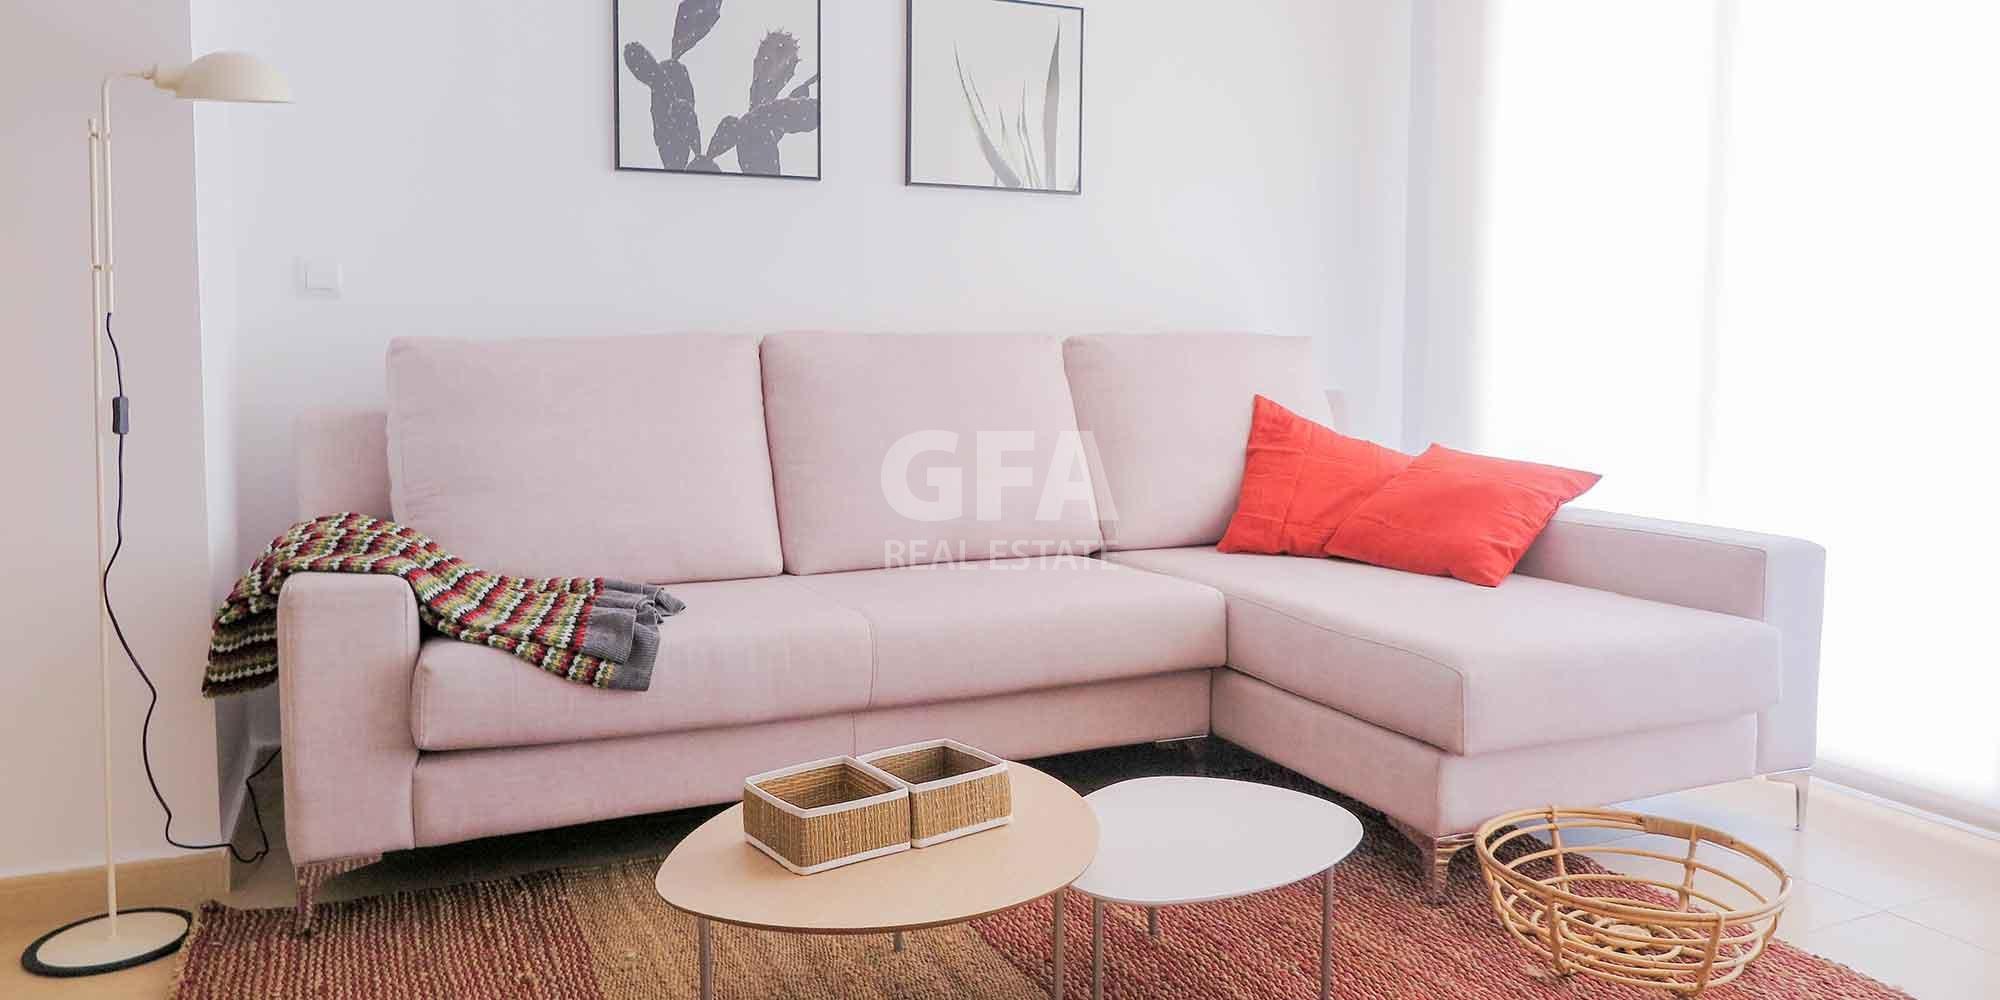 Residencial obra nueva Mar Menor Golf Resort  sofa comedor